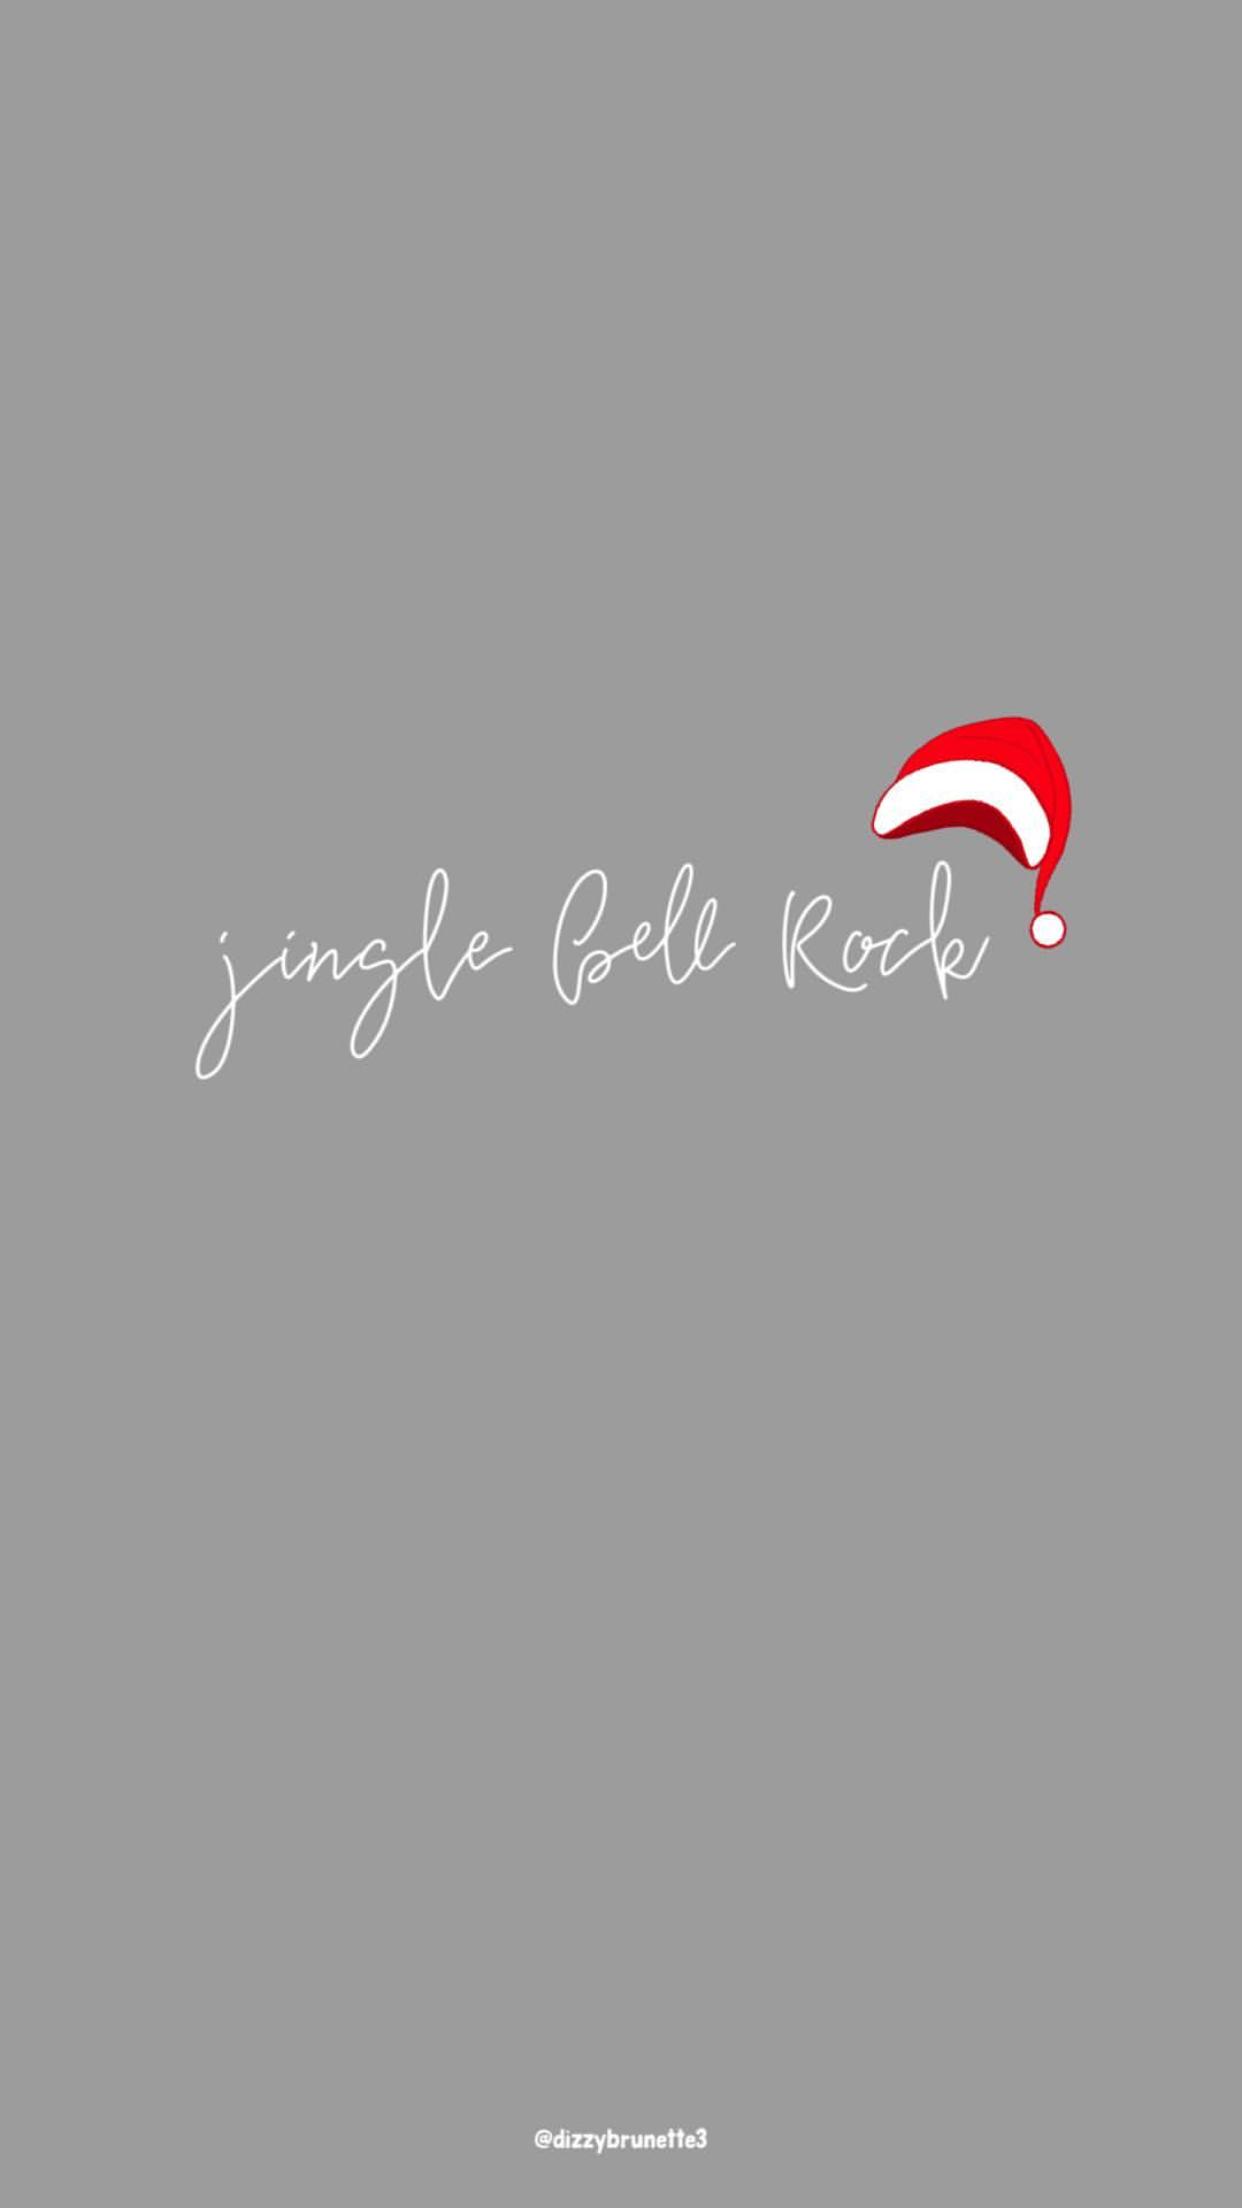 jingle bell rock ringtone for iphone 6